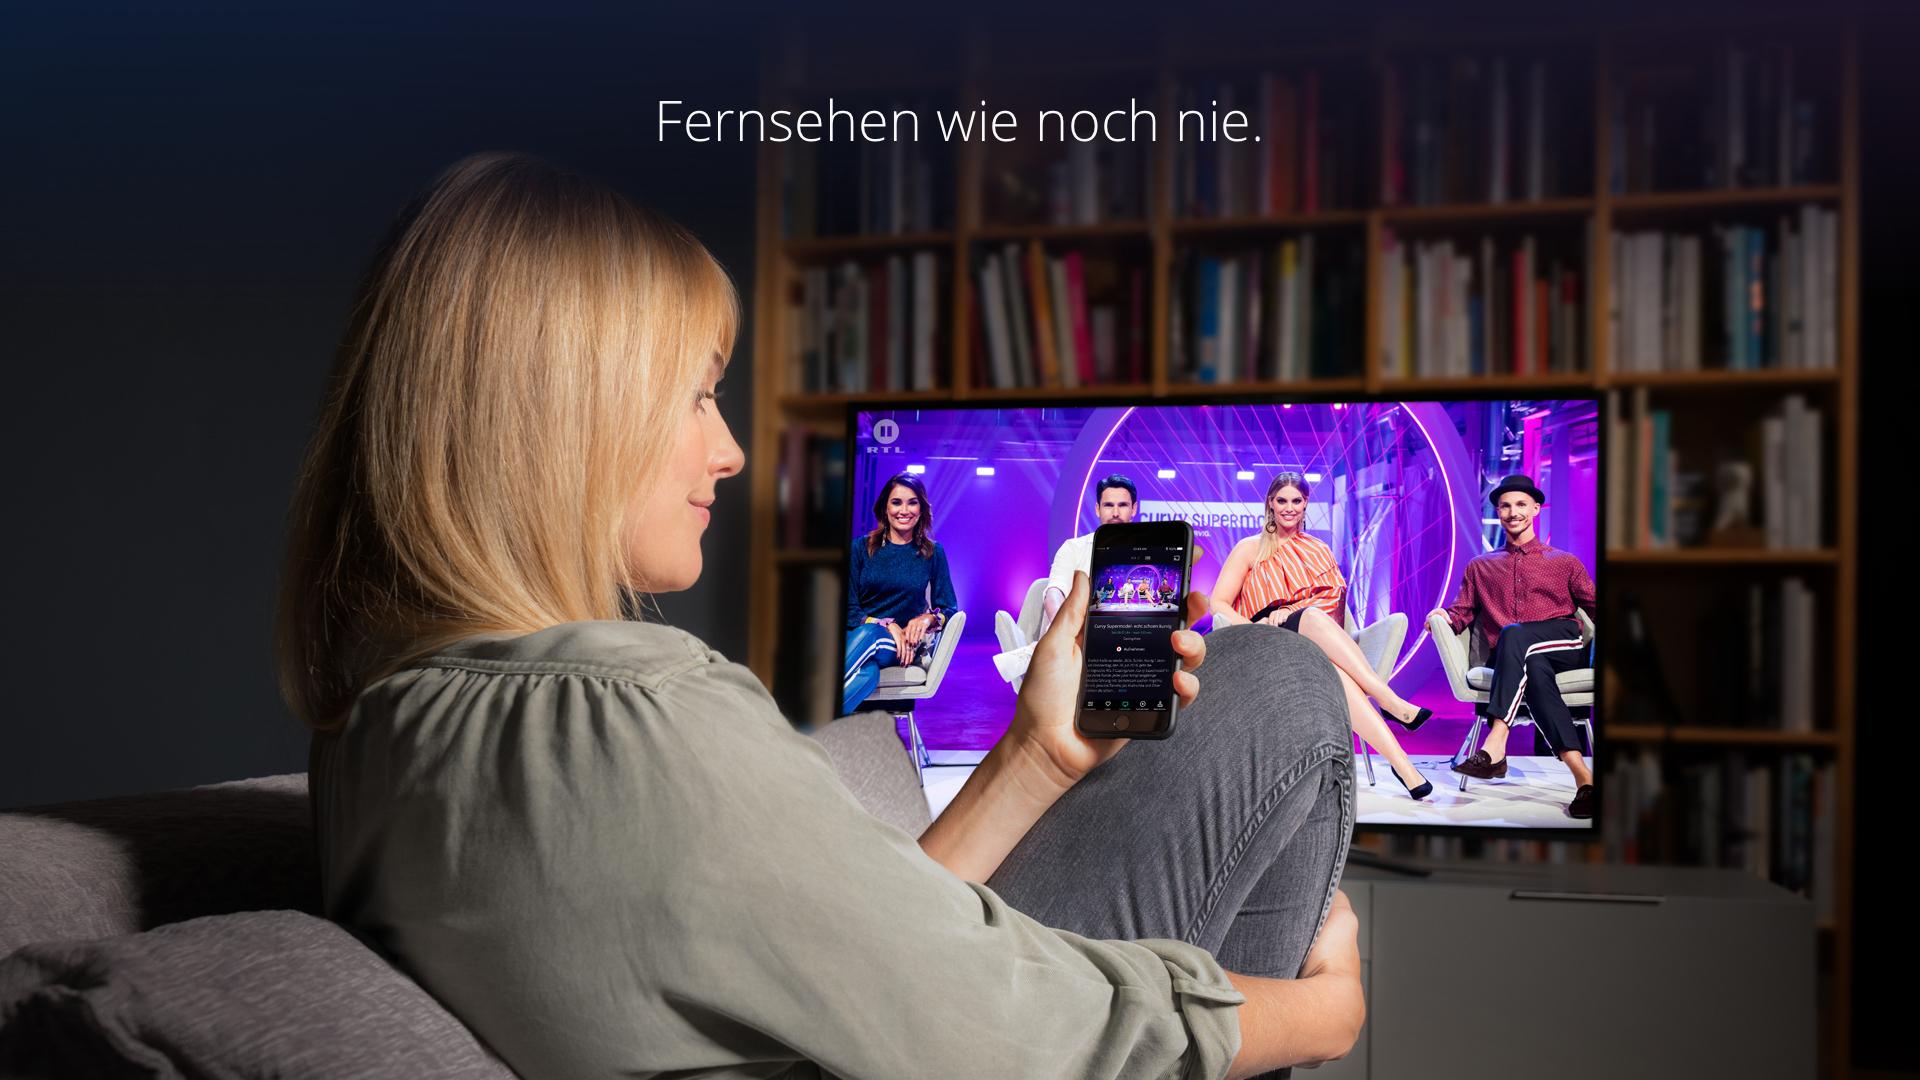 waipu.tv – Live-Fernsehen auf Fire TV